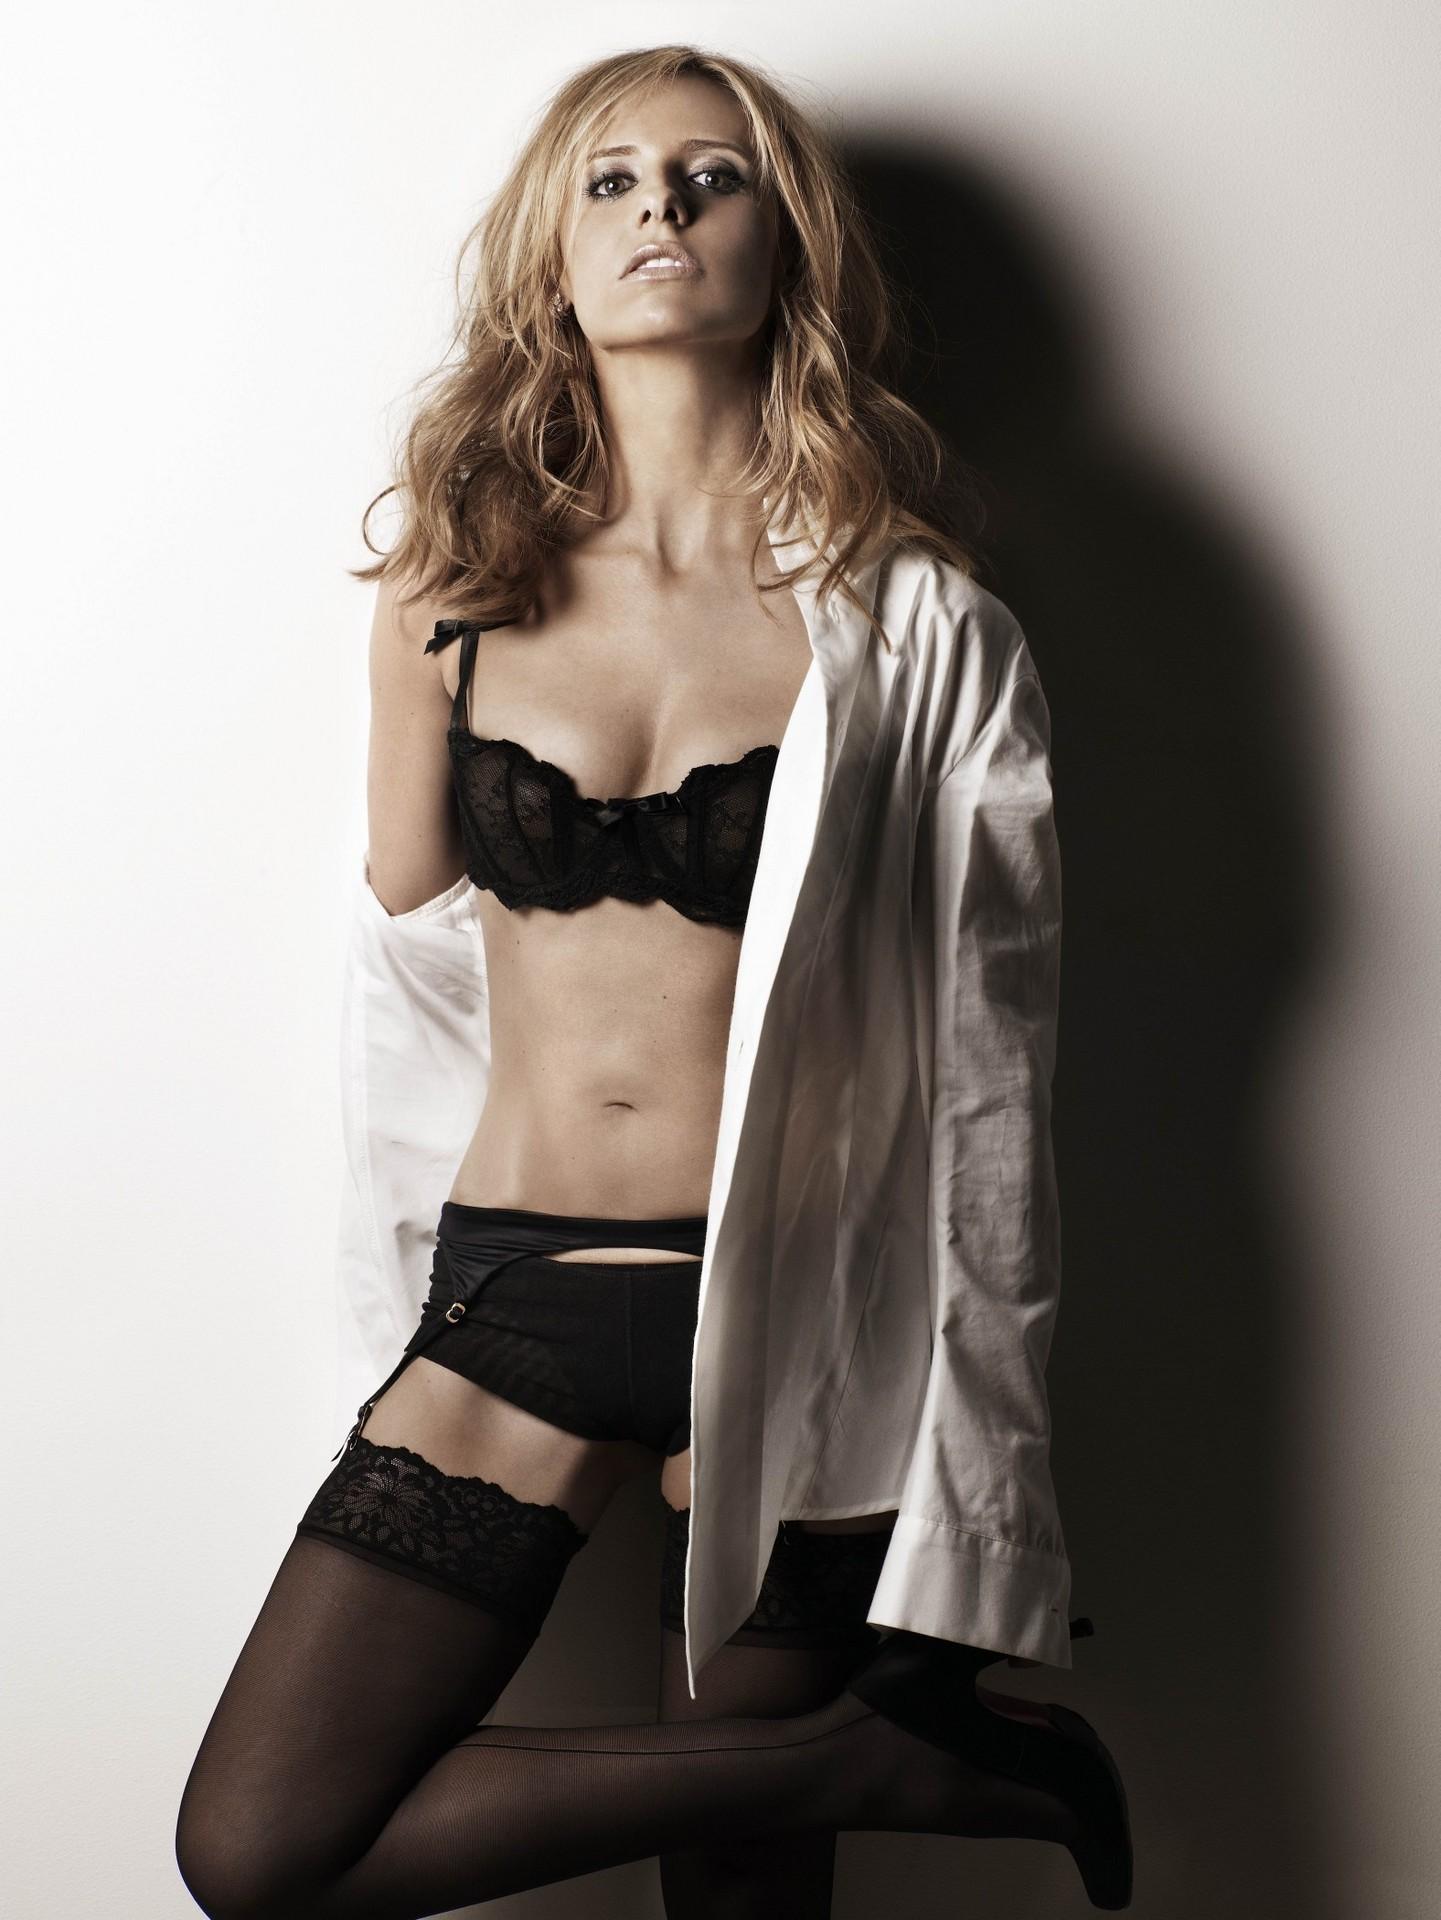 [Buffy the Vampire Slayer] Sarah Michelle Gellar : geekboners